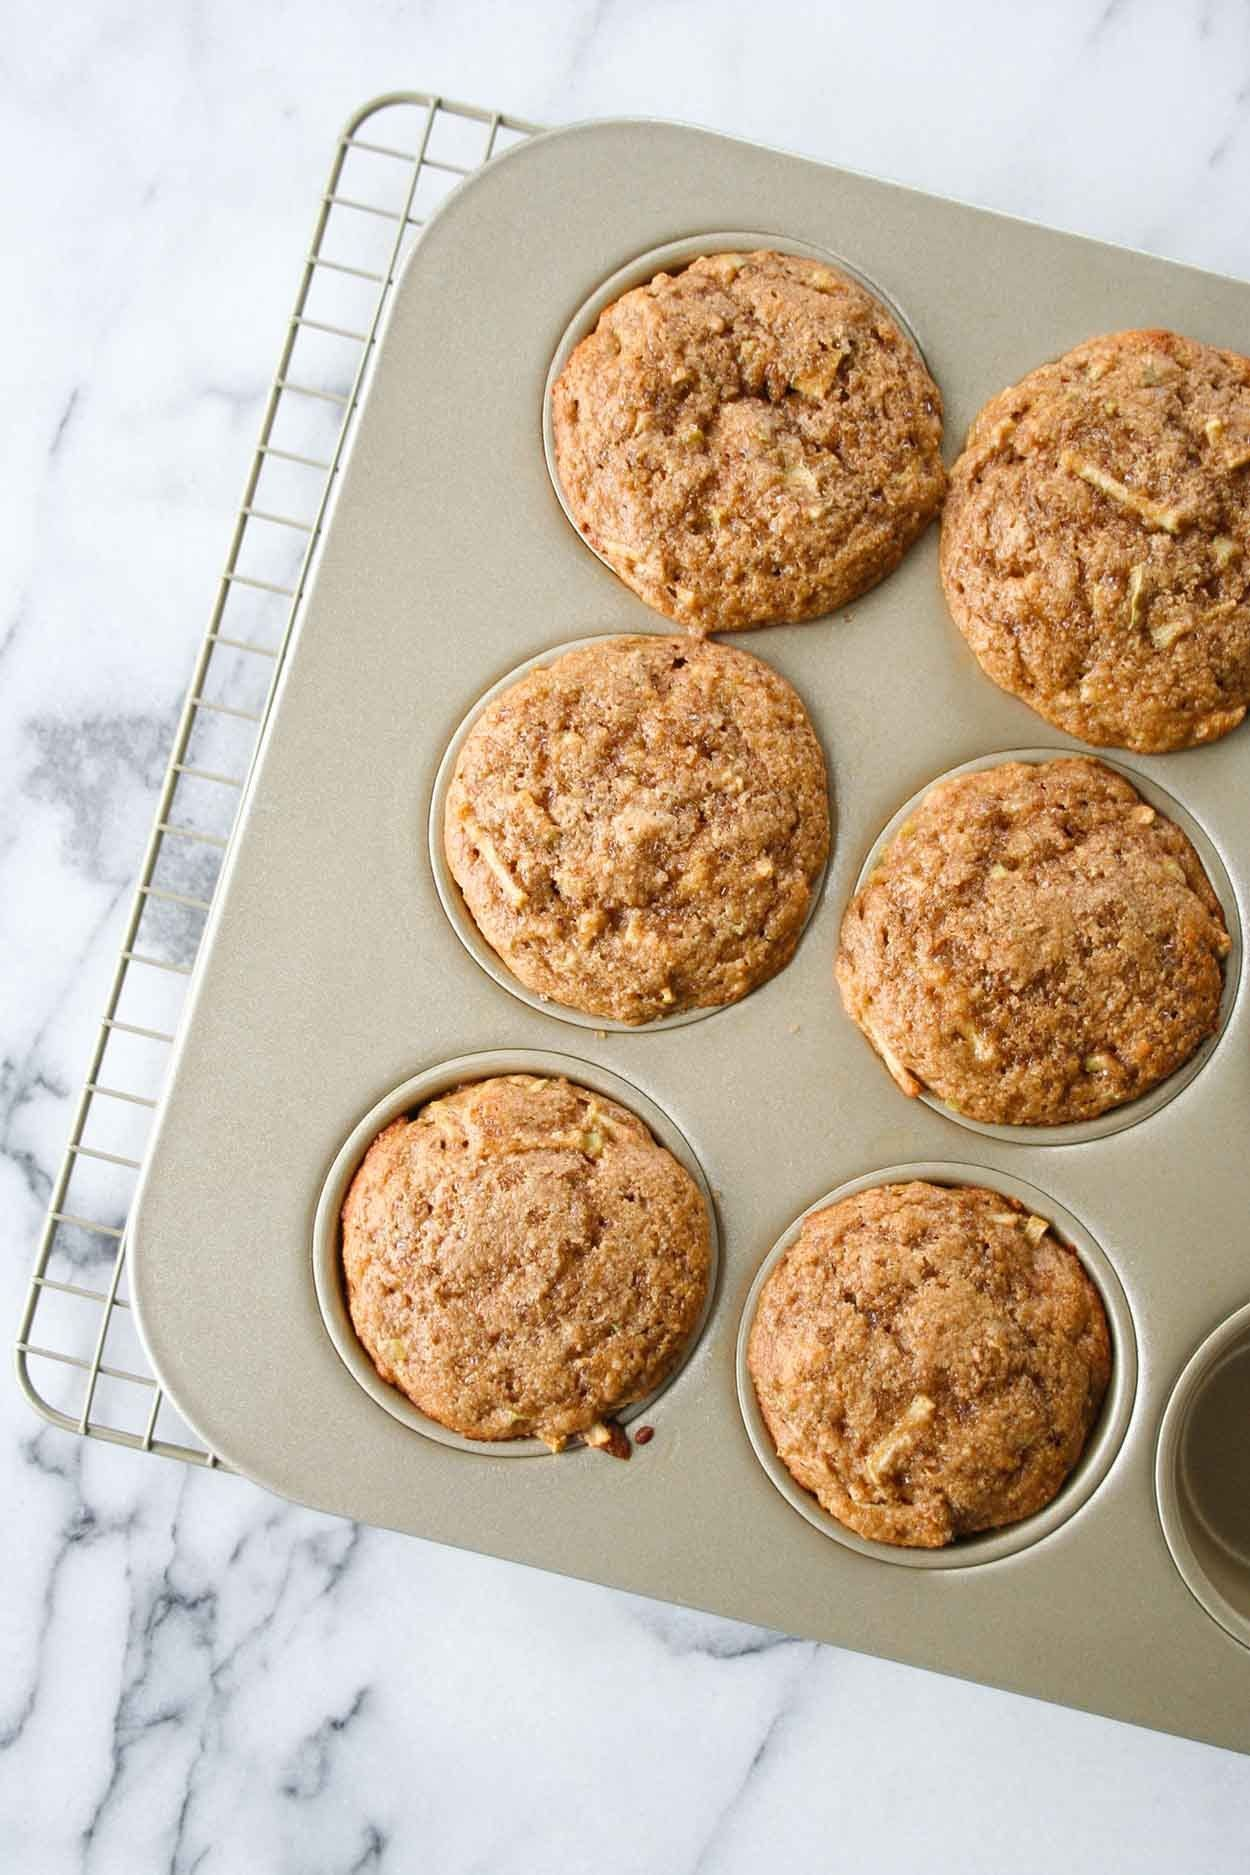 Apple Cinnamon Protein Muffins Recipe Protein Muffins Apple Recipes Kodiak Cakes